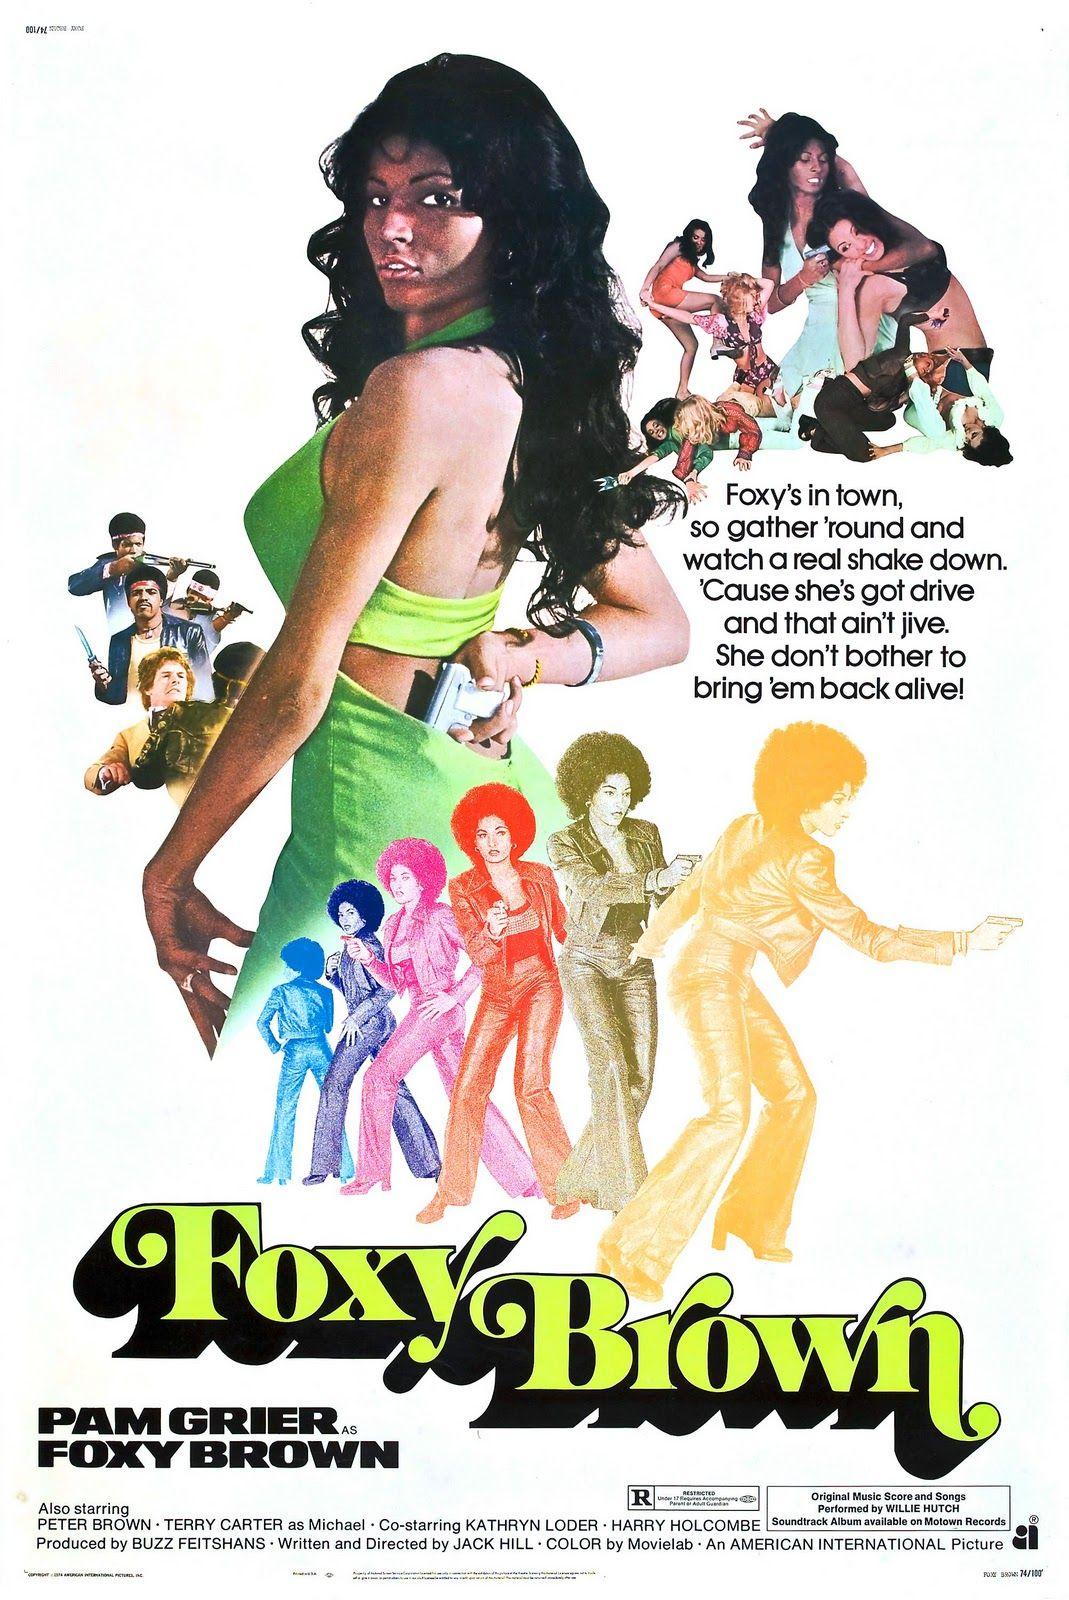 Foxy Brown T Shirt; Pam Grier Foxy Brown Movie Poster tee shirt